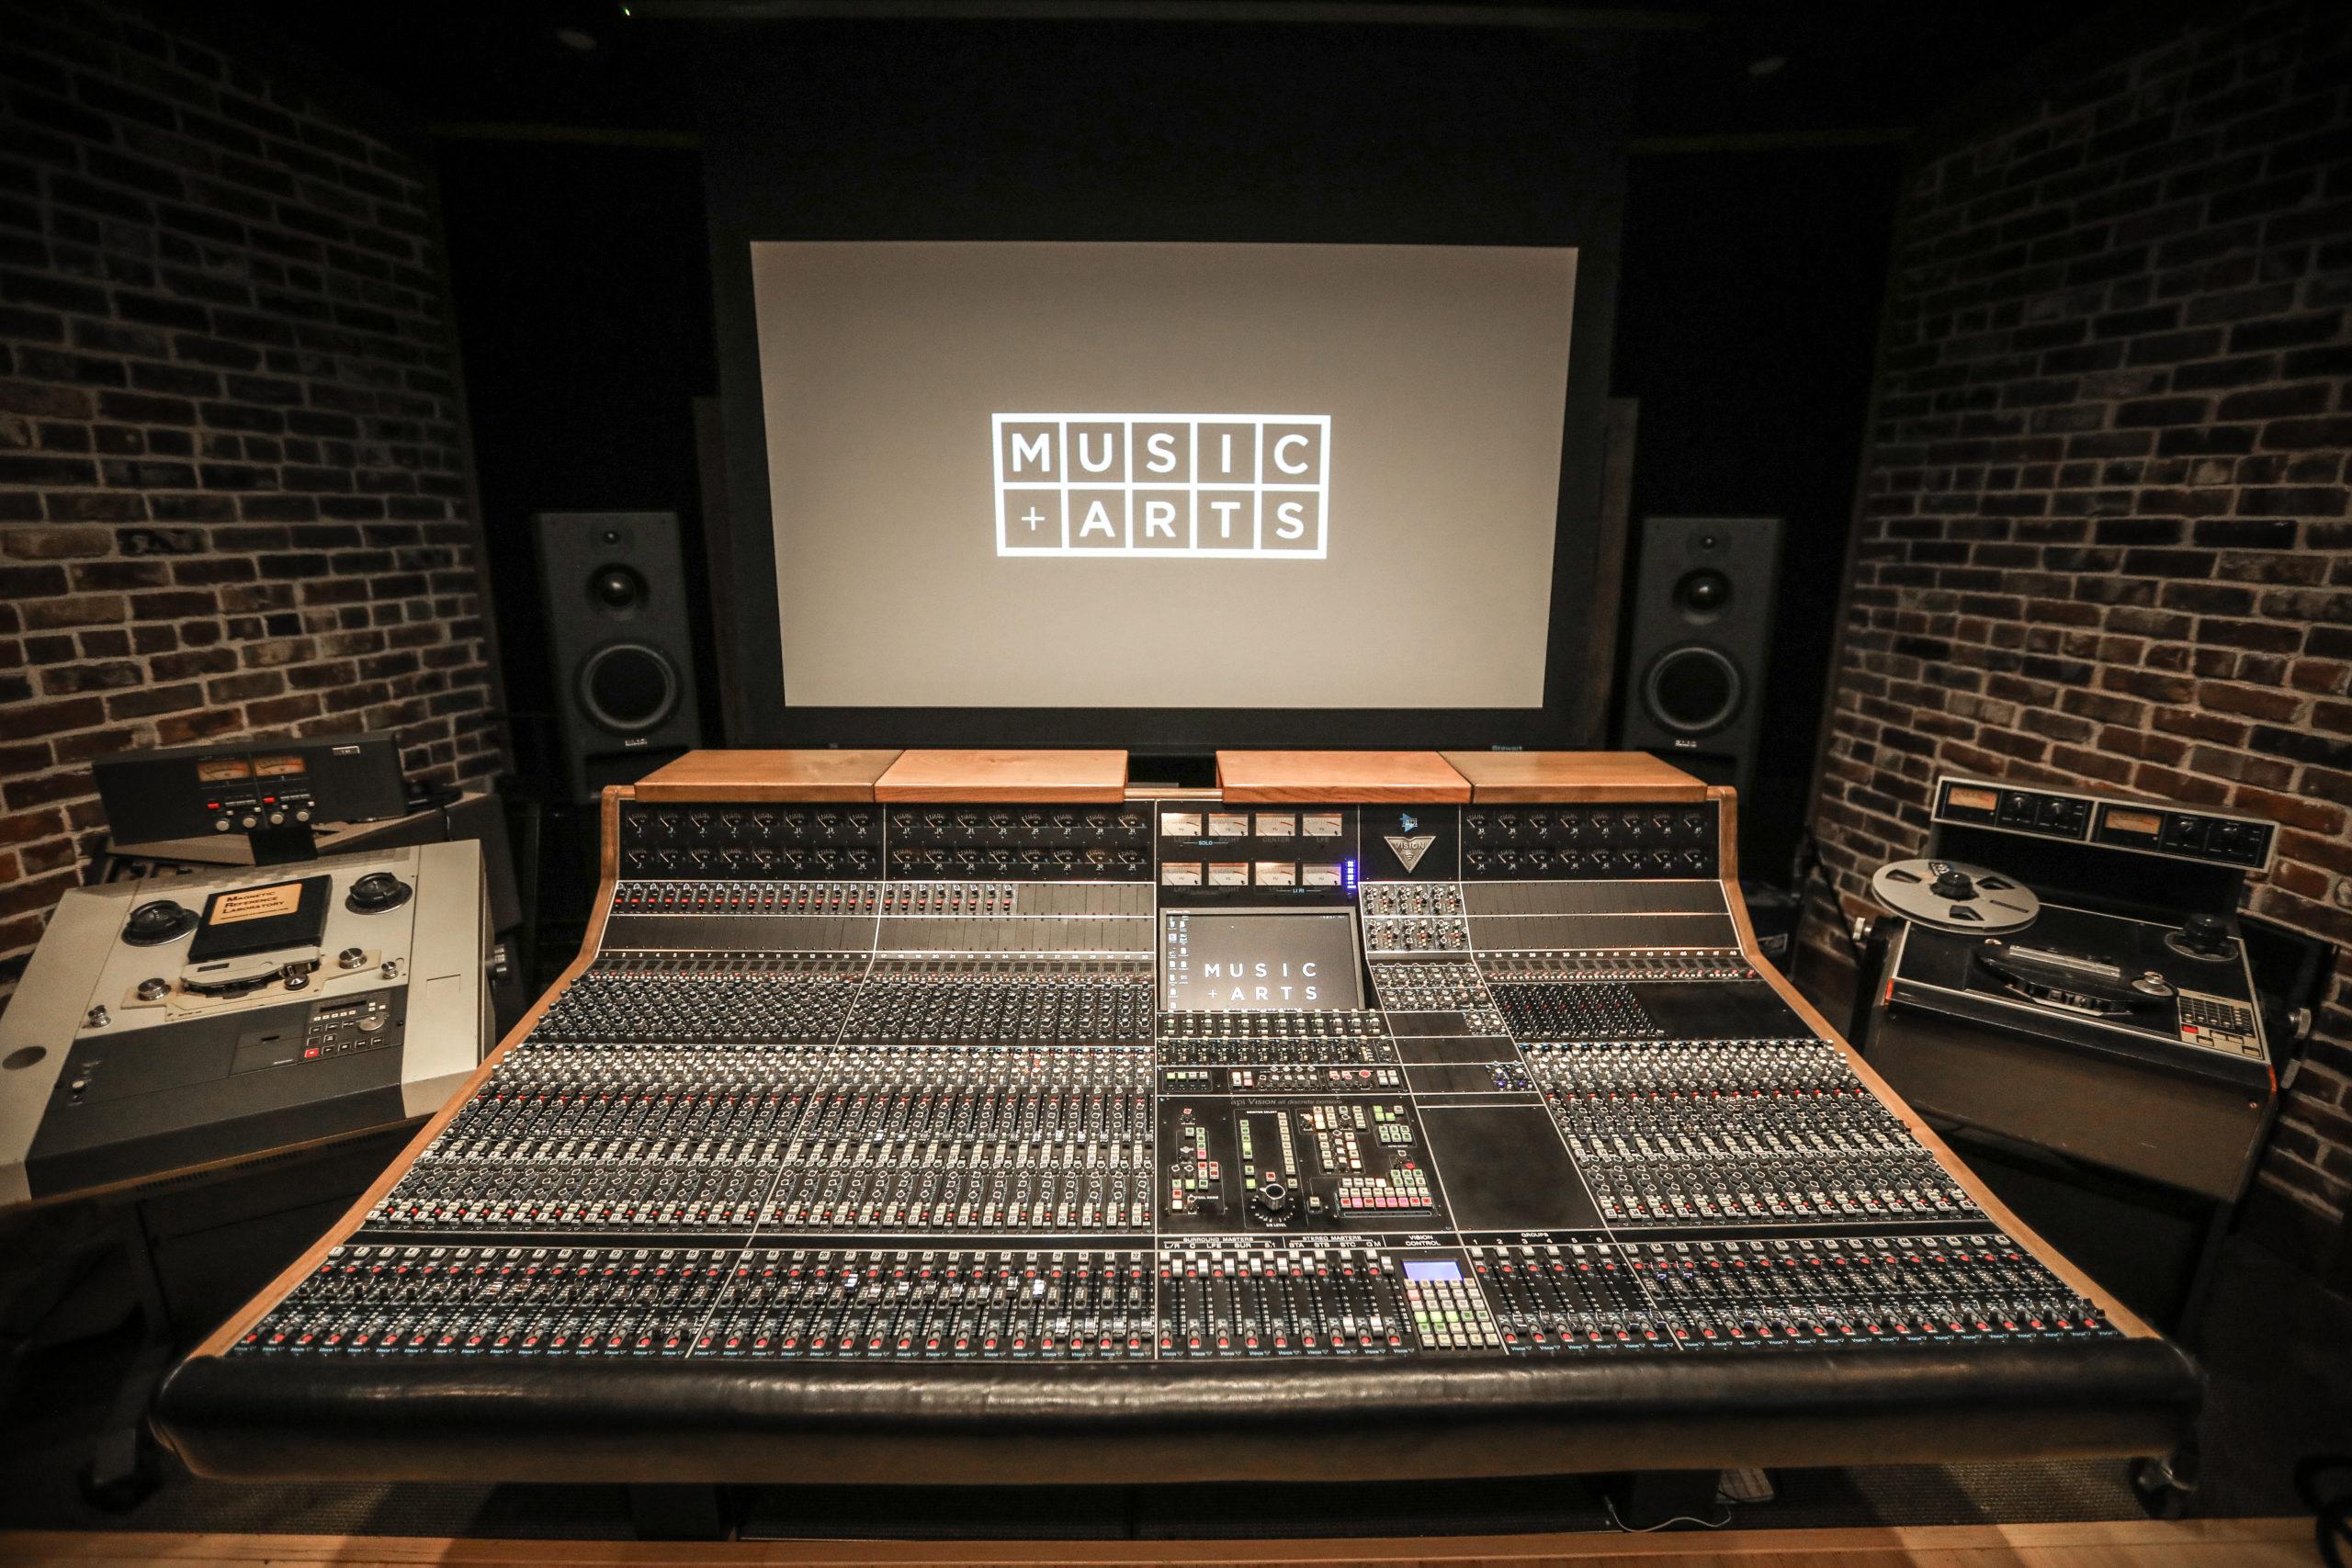 Music+Arts Studio